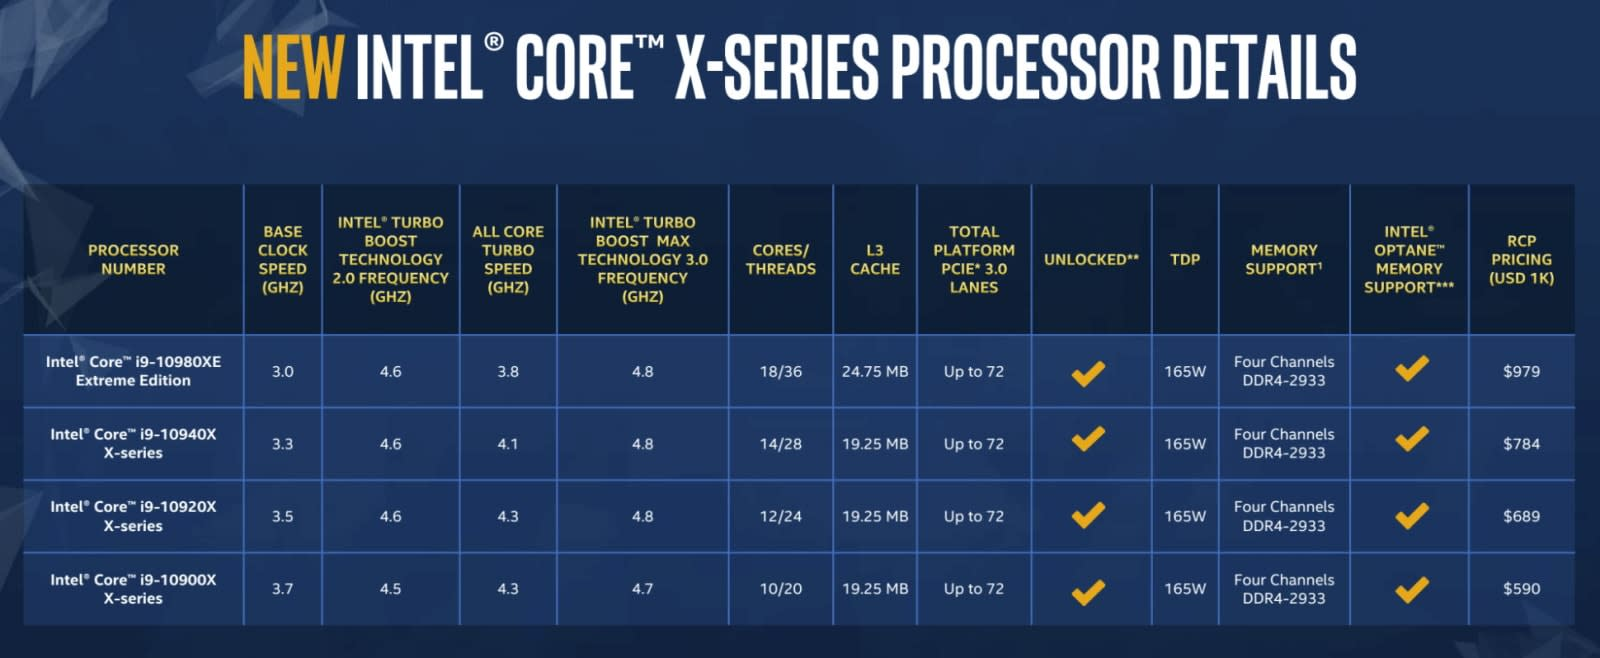 Intel Core X-Series and W-series Xeon updates